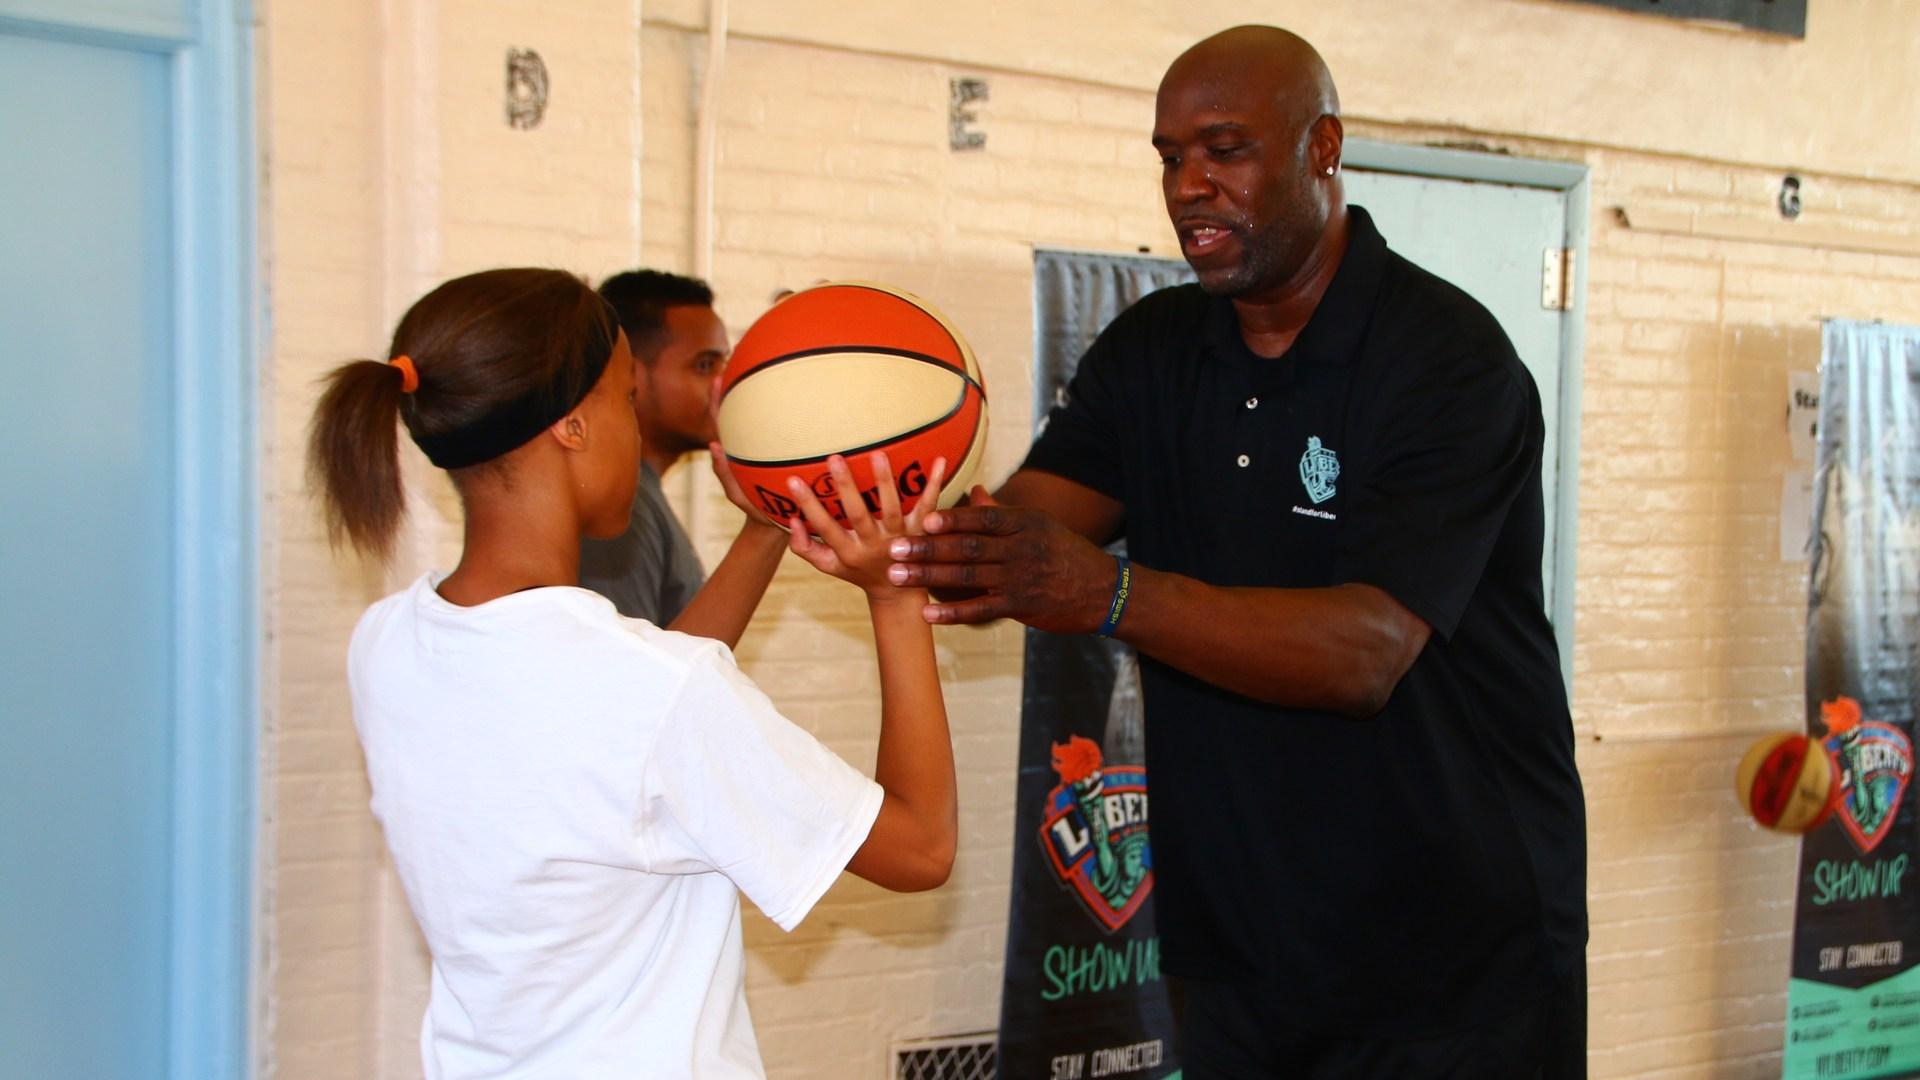 Coach teaching a girl how to shoot a basketball